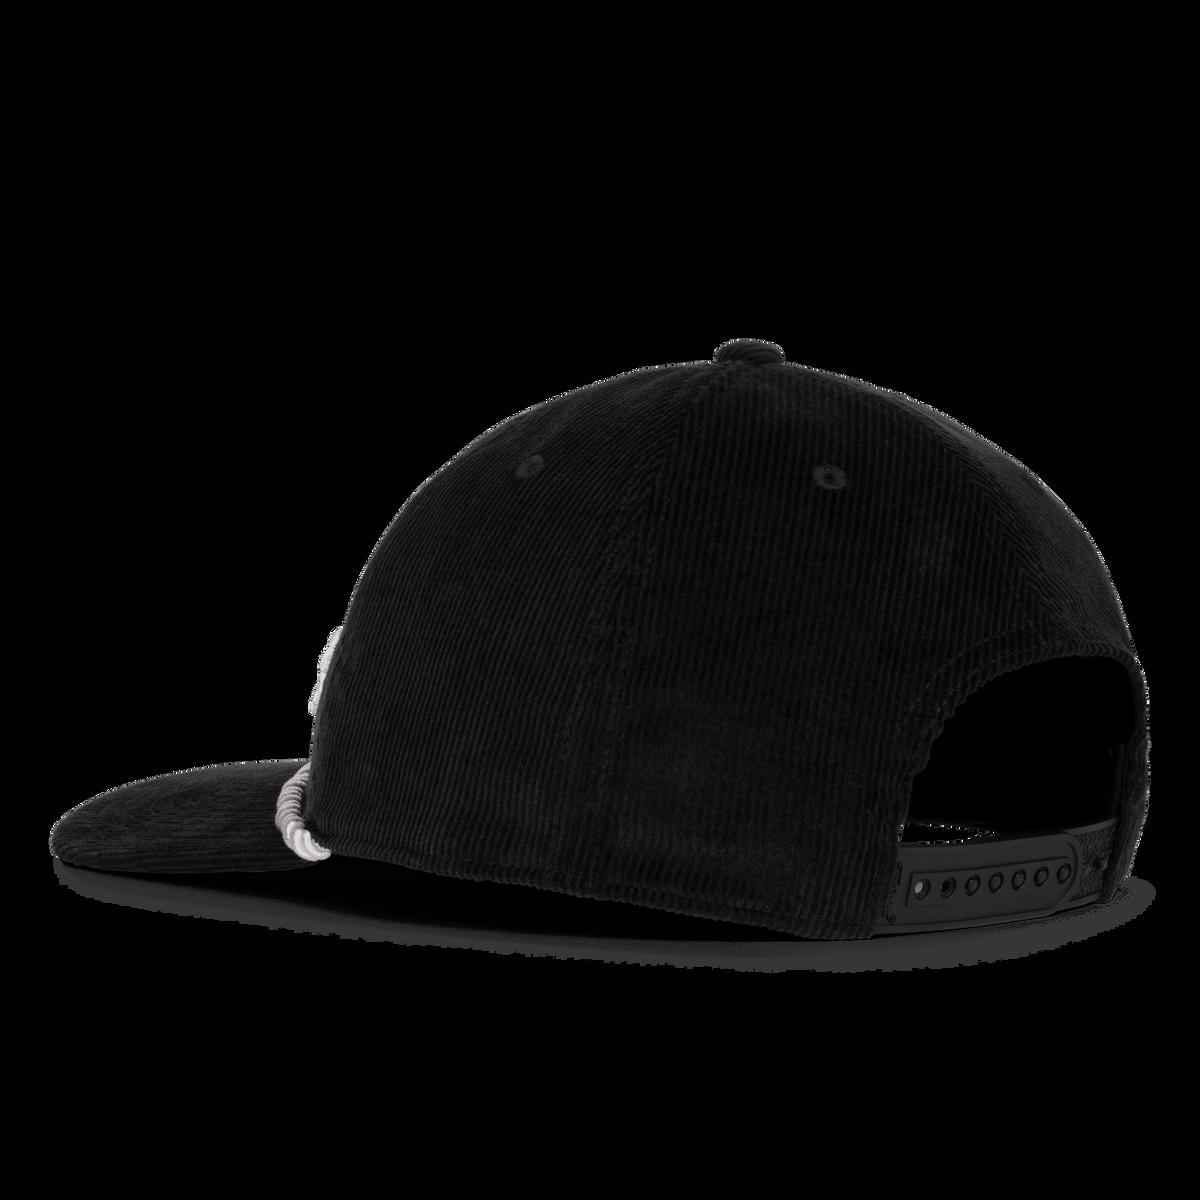 Corduroy Rope Hat